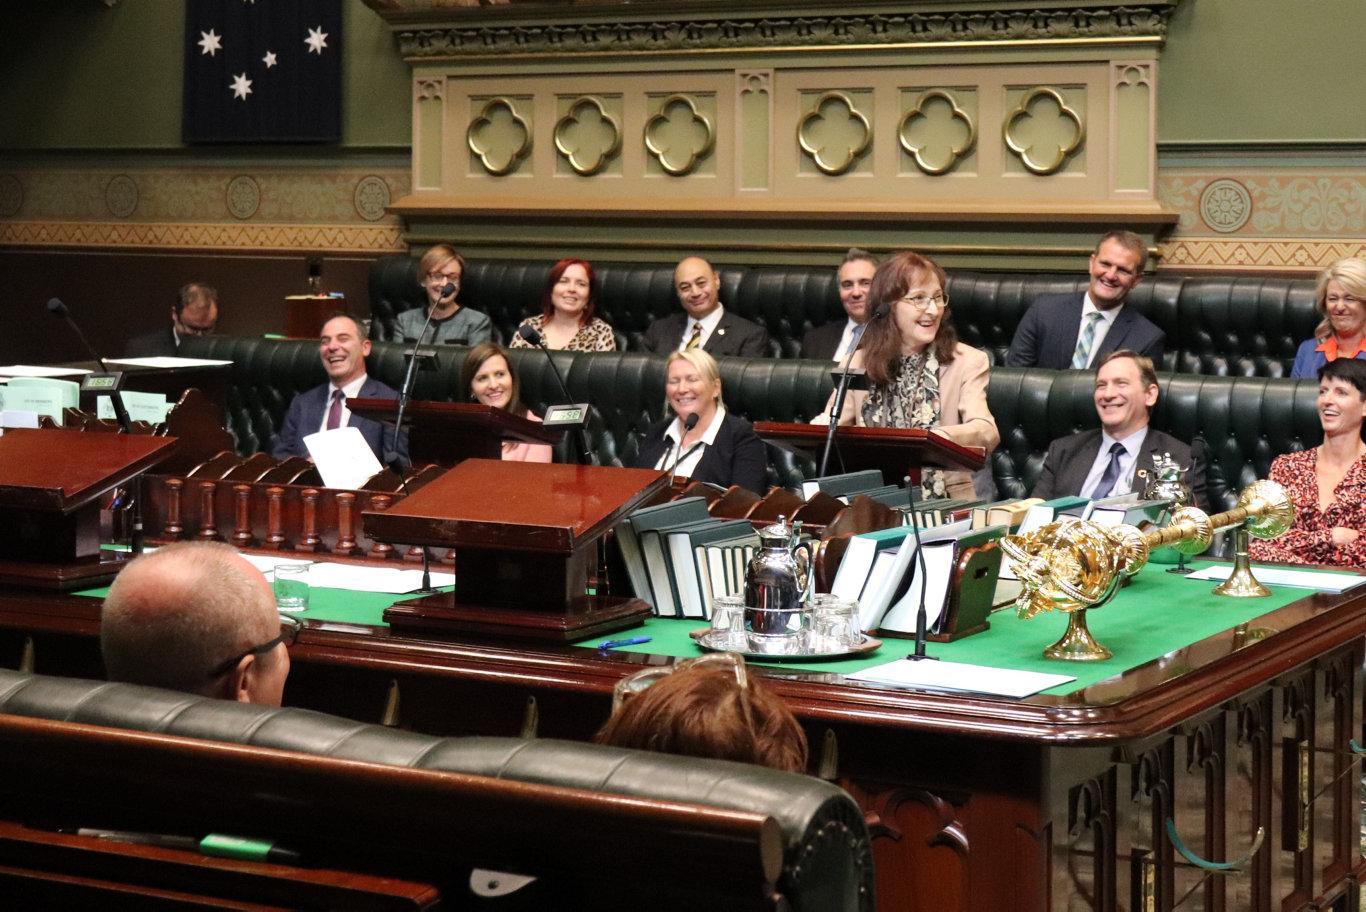 Lismore MP Janelle Saffin delivering her maiden speech at NSW Parliament.